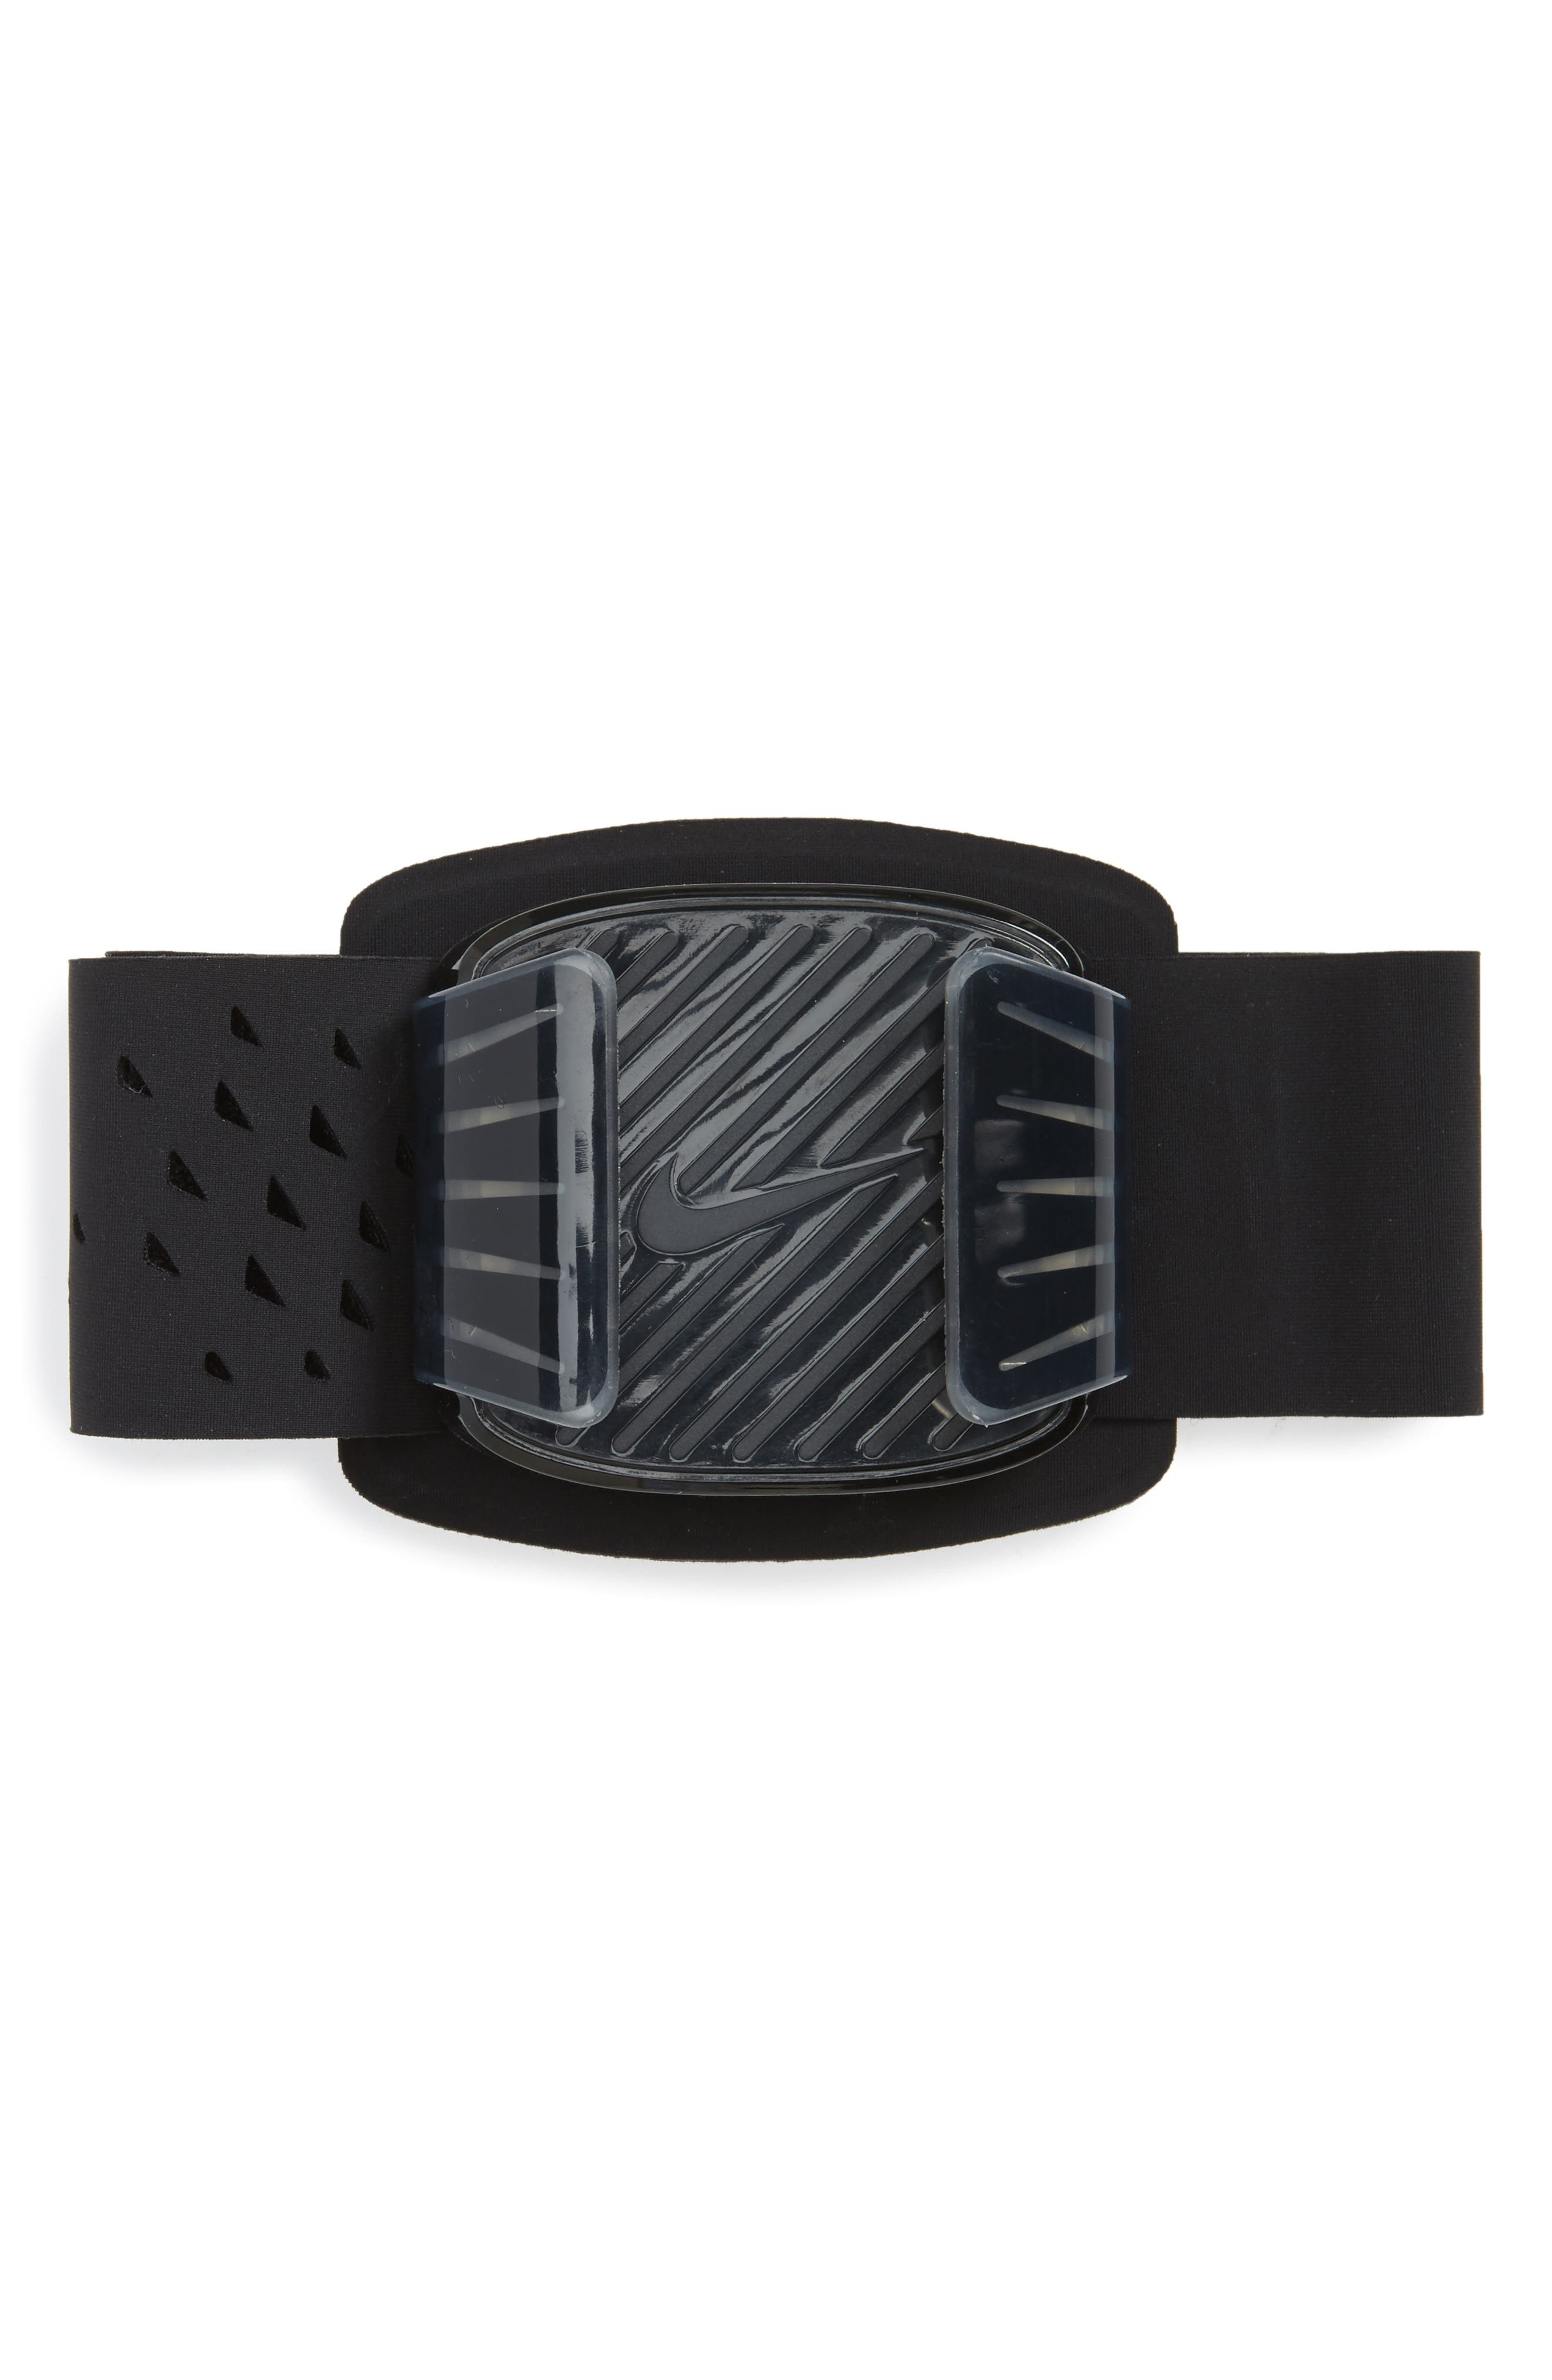 Universal Running Armband,                             Main thumbnail 1, color,                             Black/ Clear/ Silver